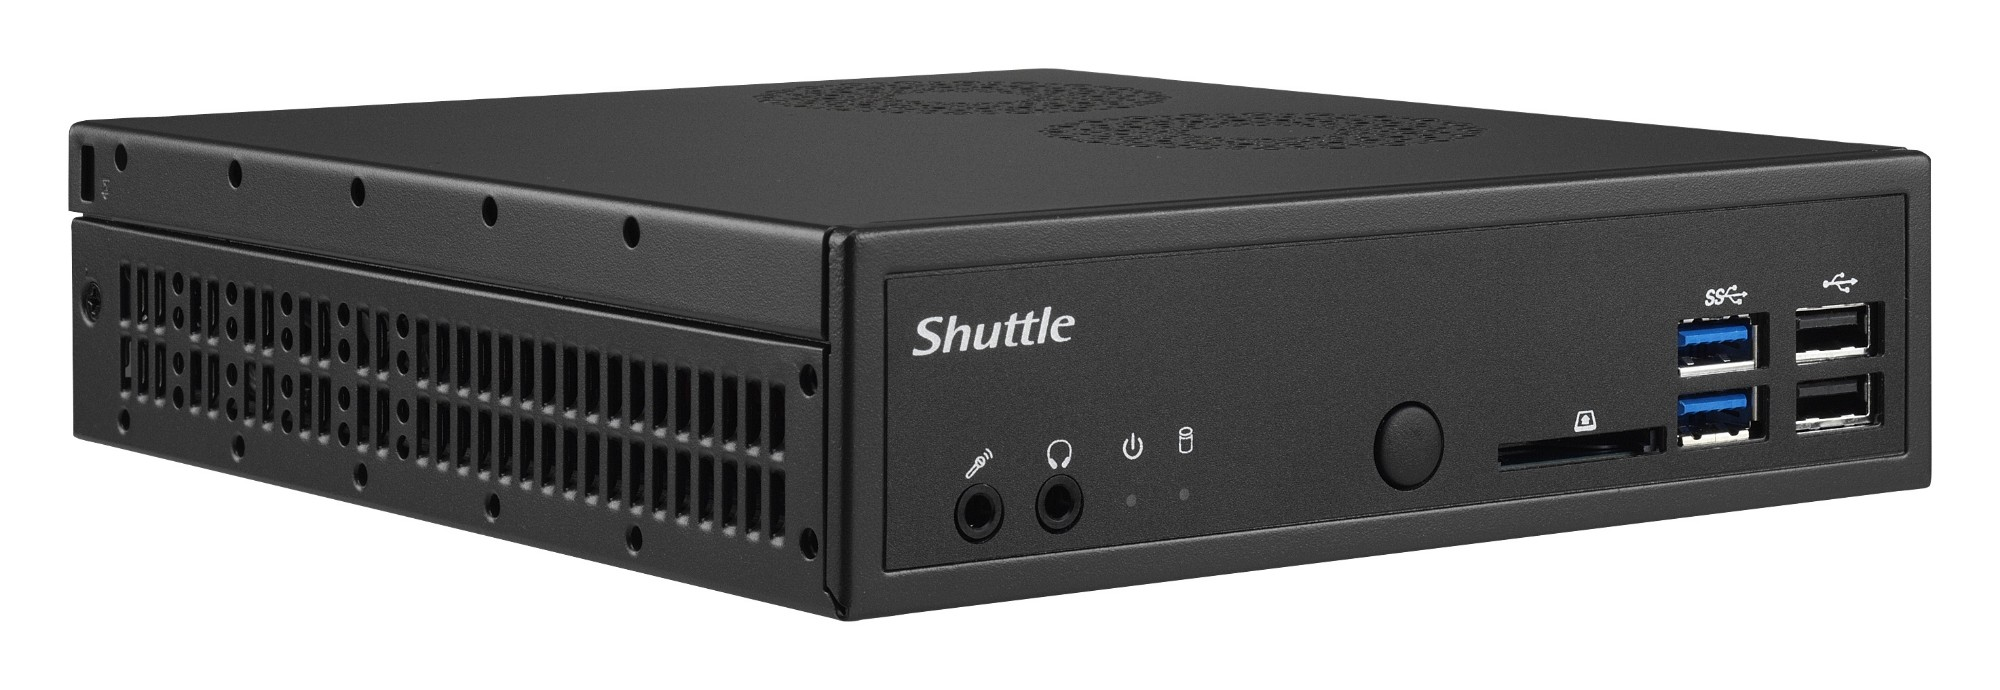 Shuttle XPС slim DH110 Intel H110 LGA 1151 (Socket H4) 1.3L sized PC Black PC/workstation barebone